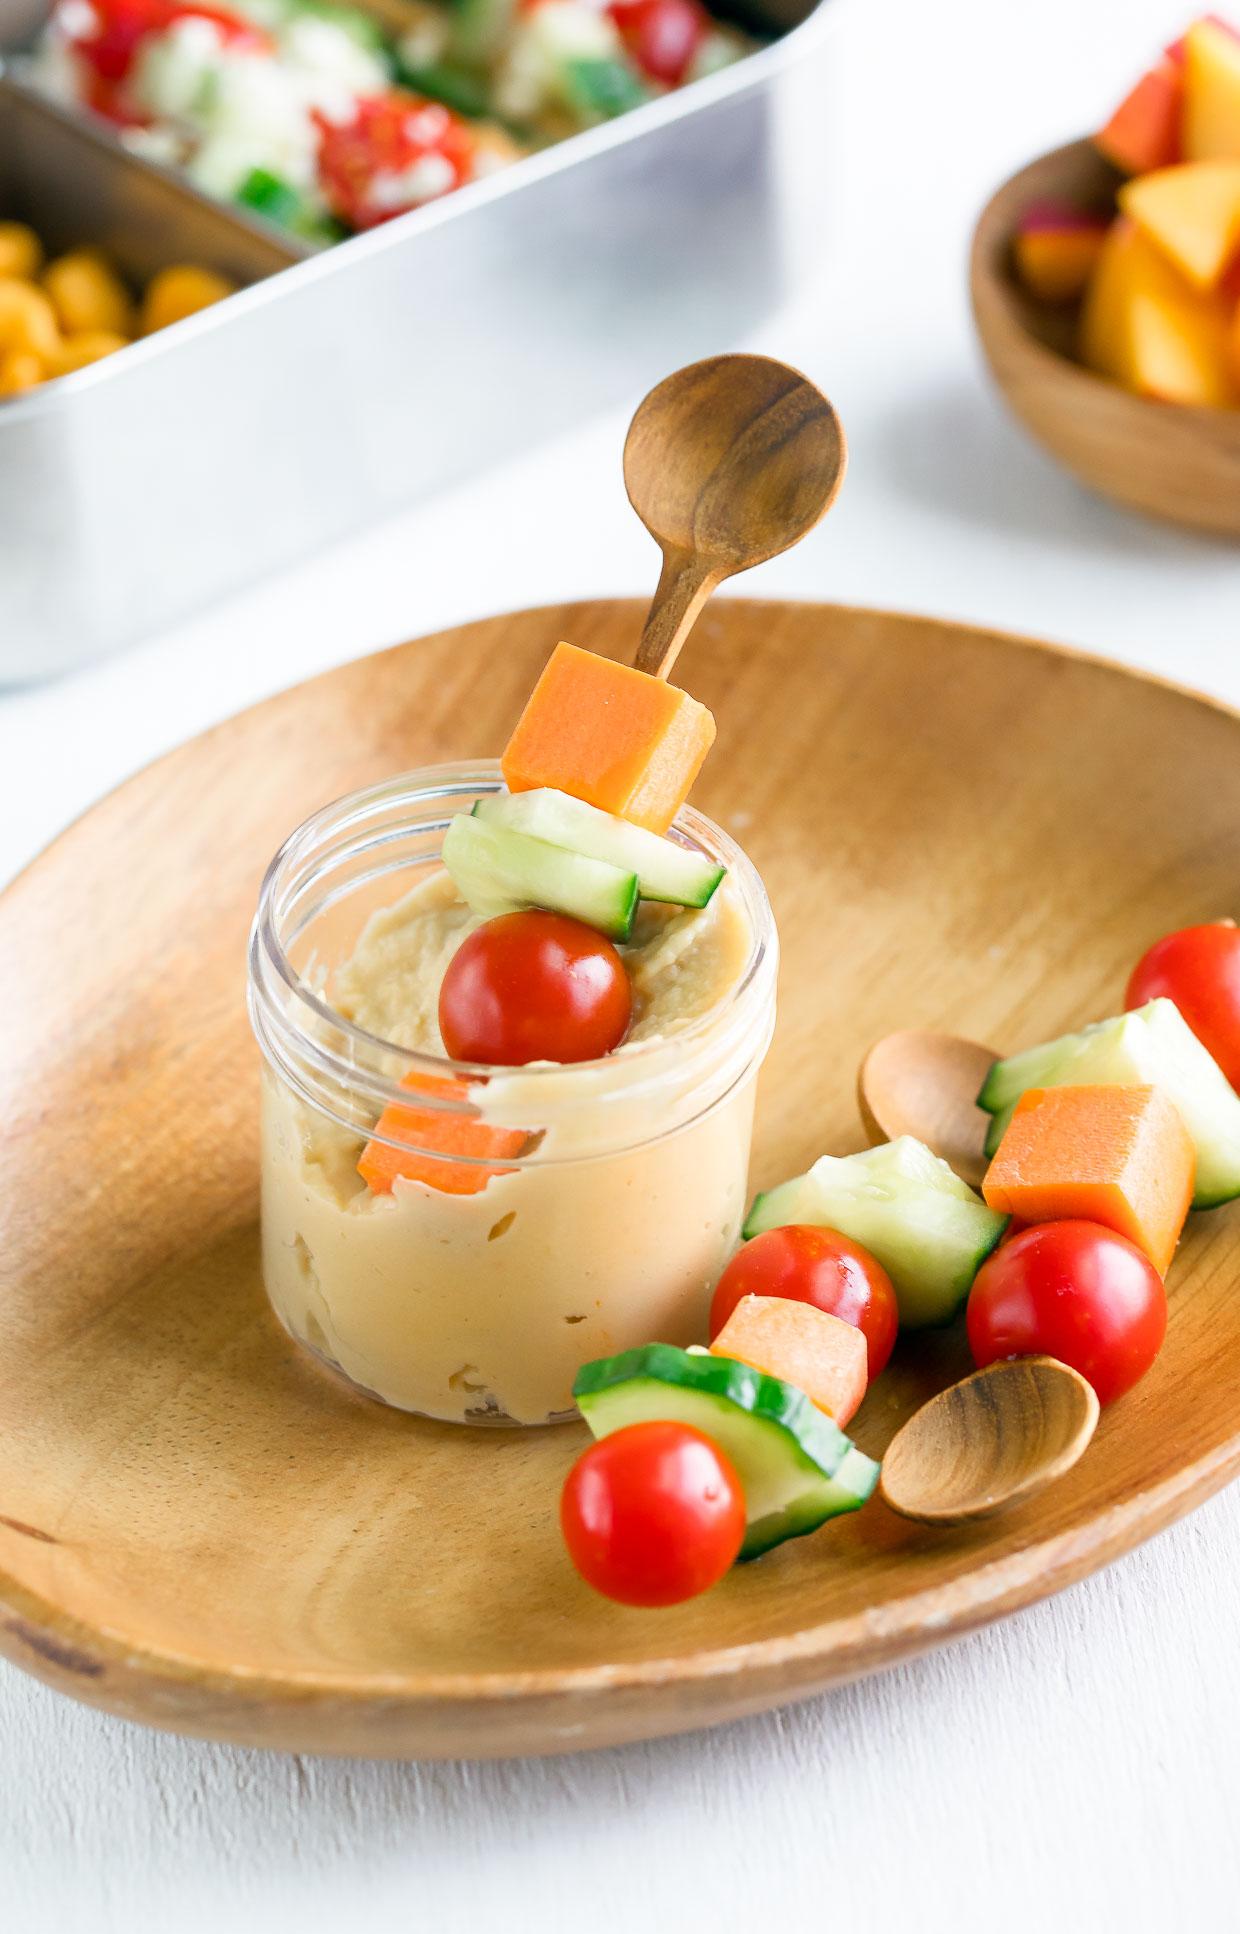 Veggie Kabobs with Hummus